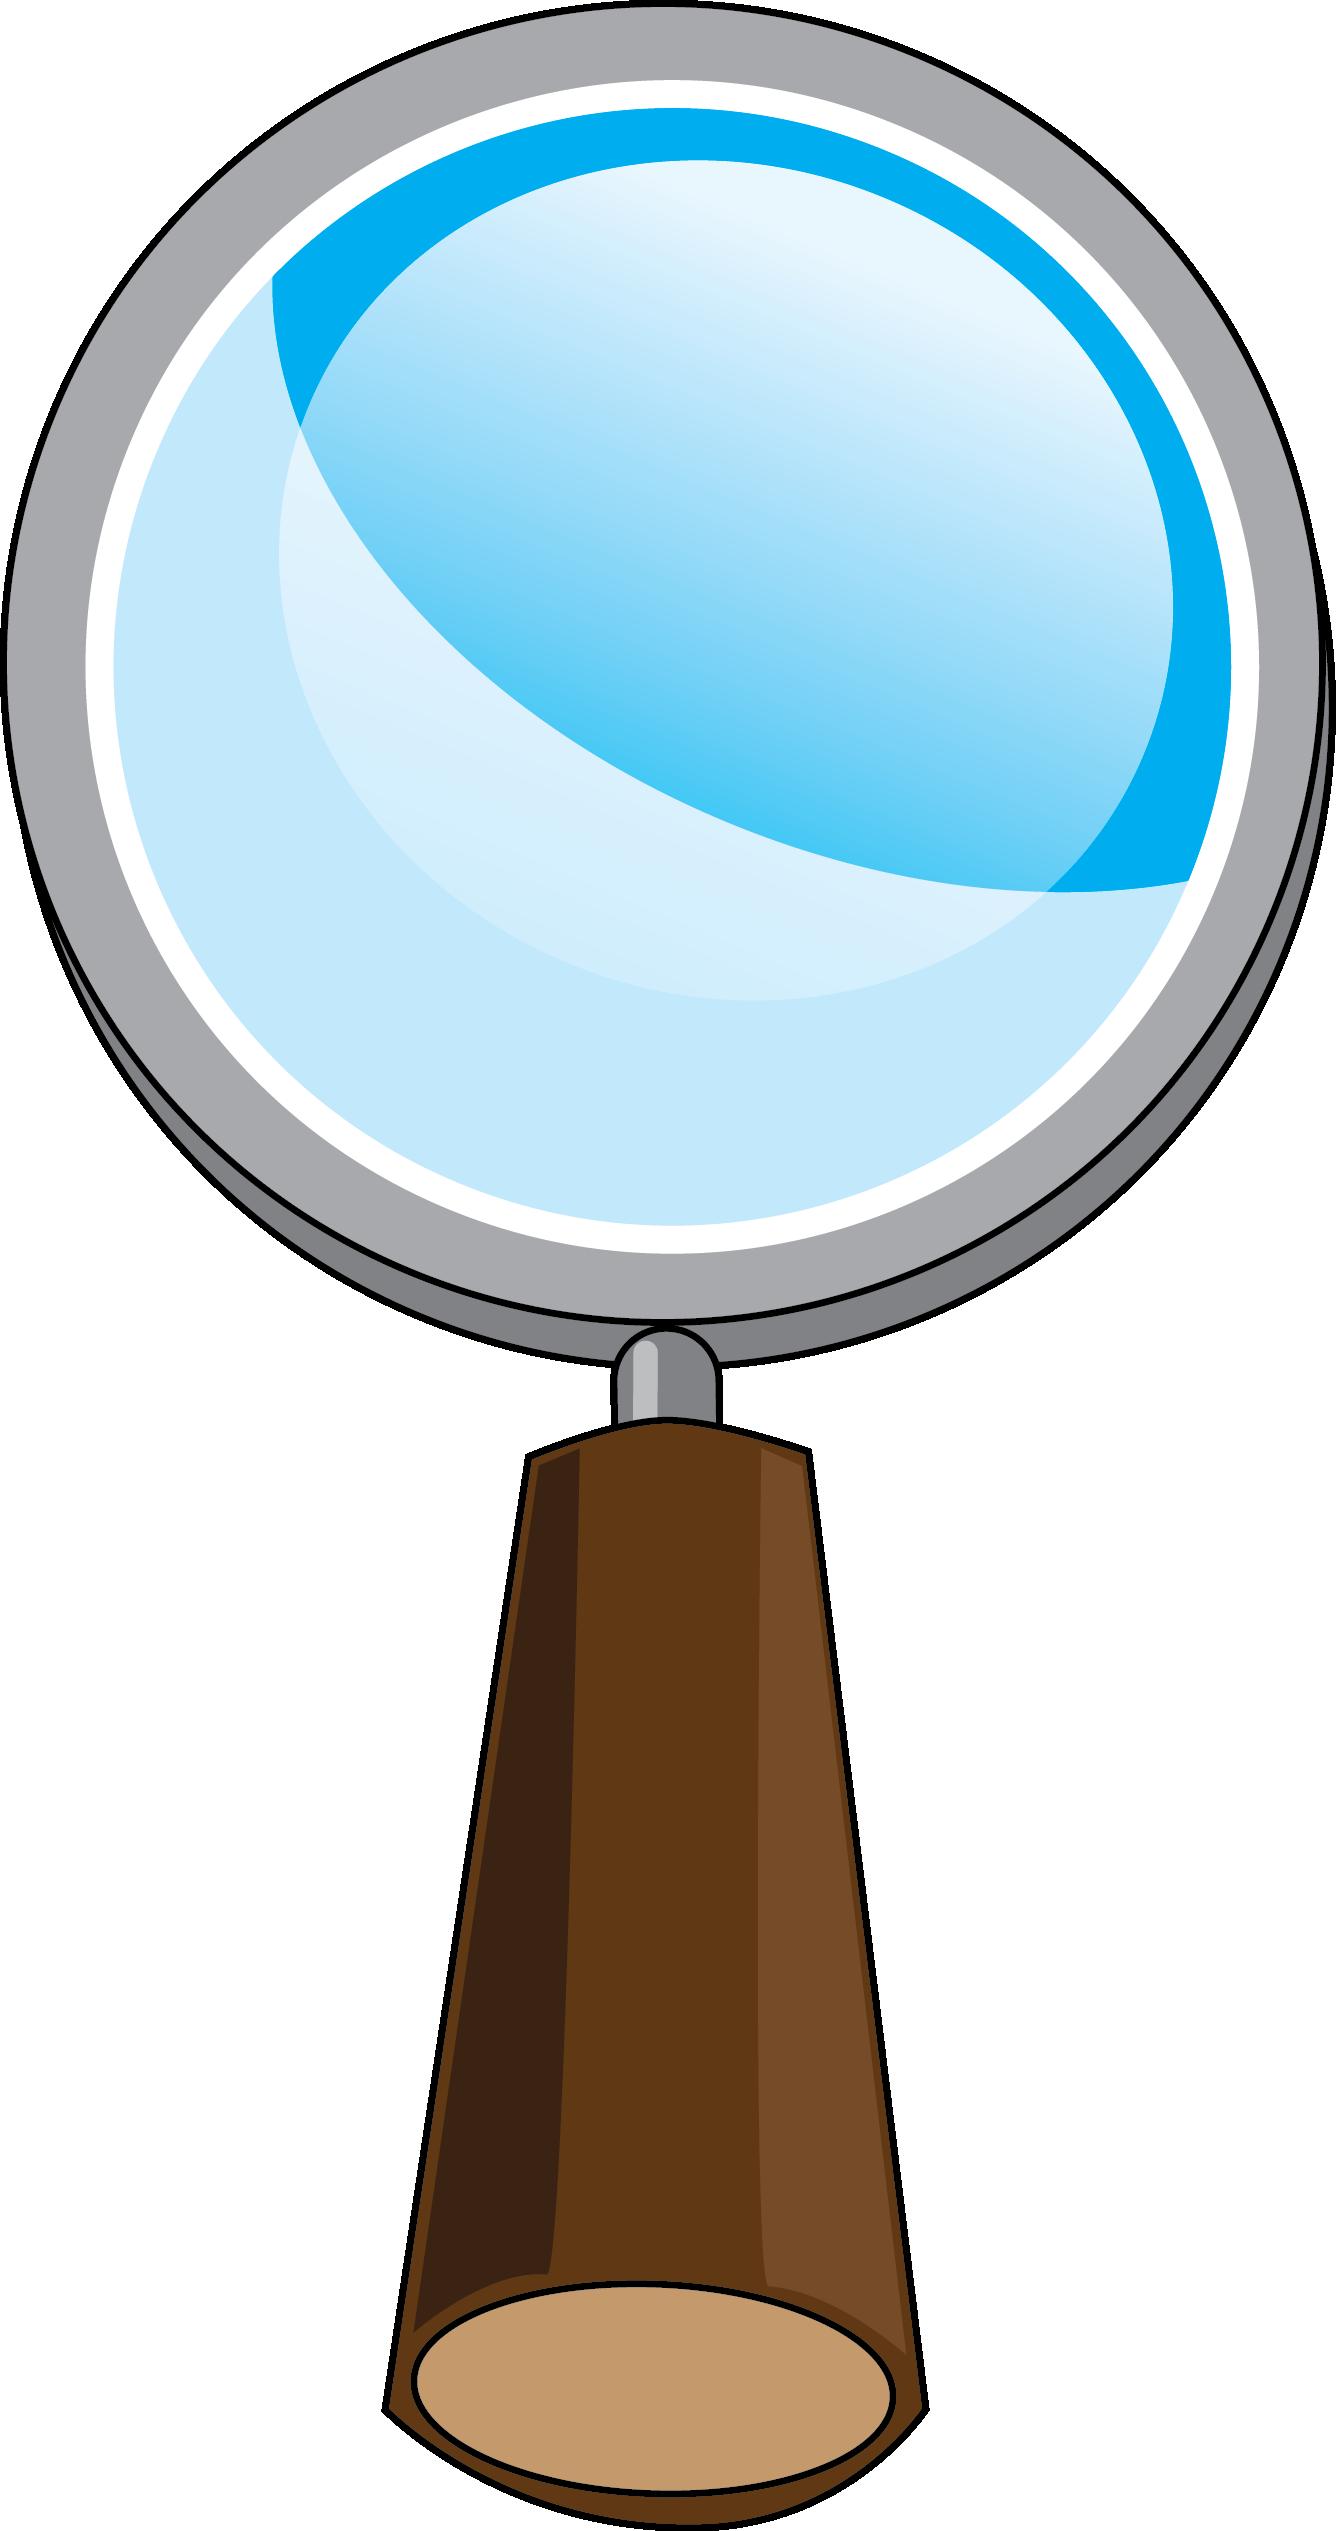 Magnifying glass magnifier glass clip art at vector clip art.